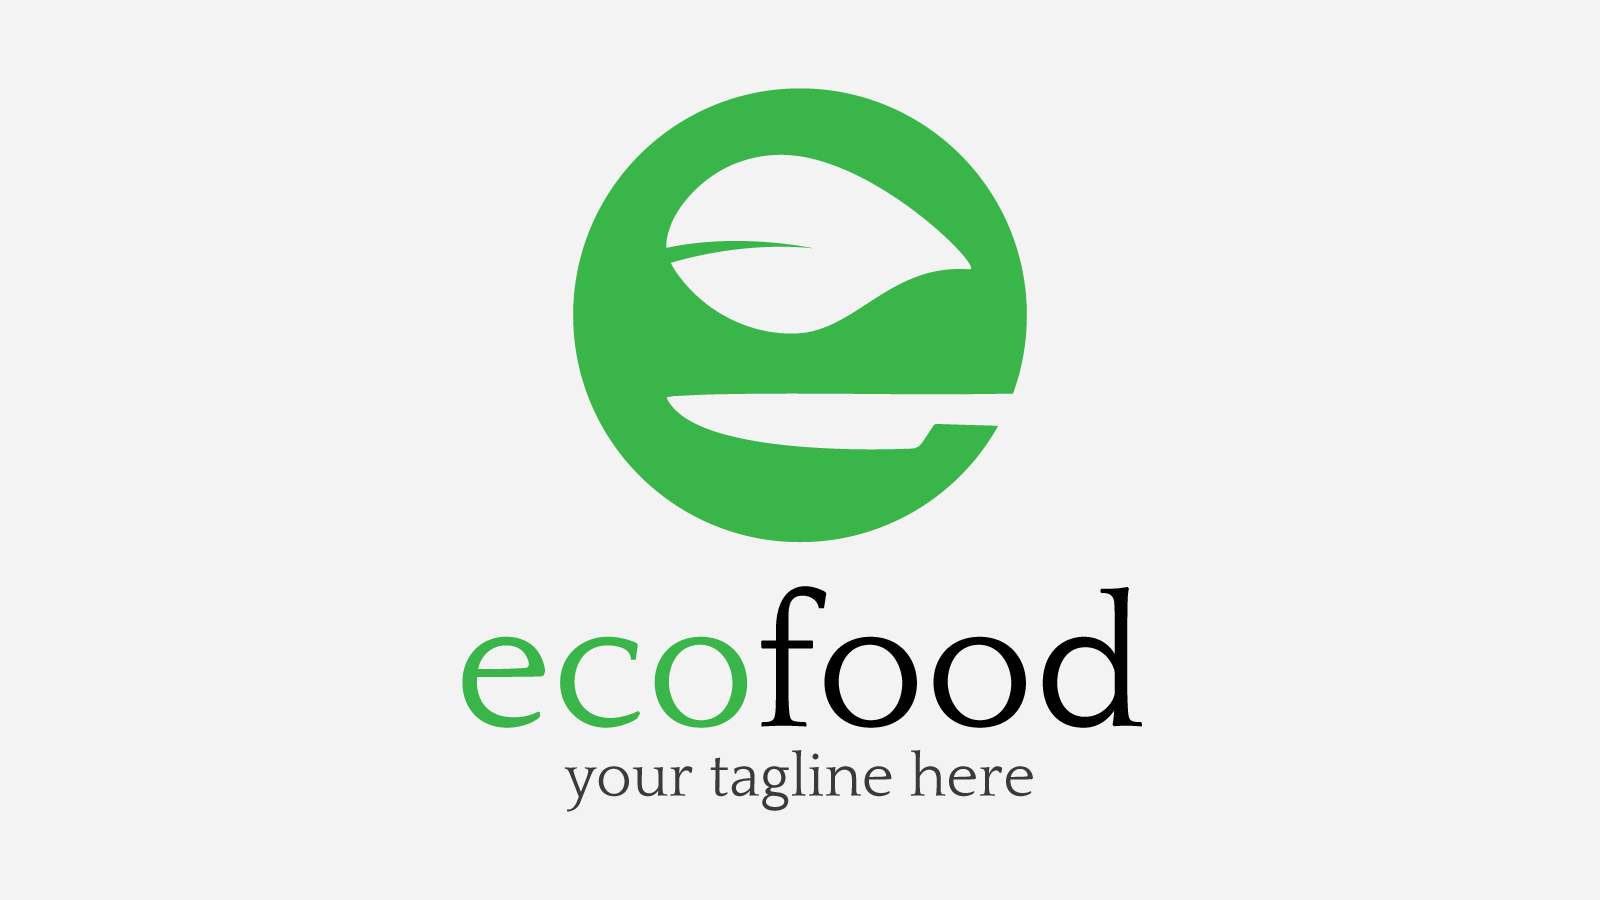 Ecofood free logo design zfreegraphic free vector logo for Design a company logo free templates